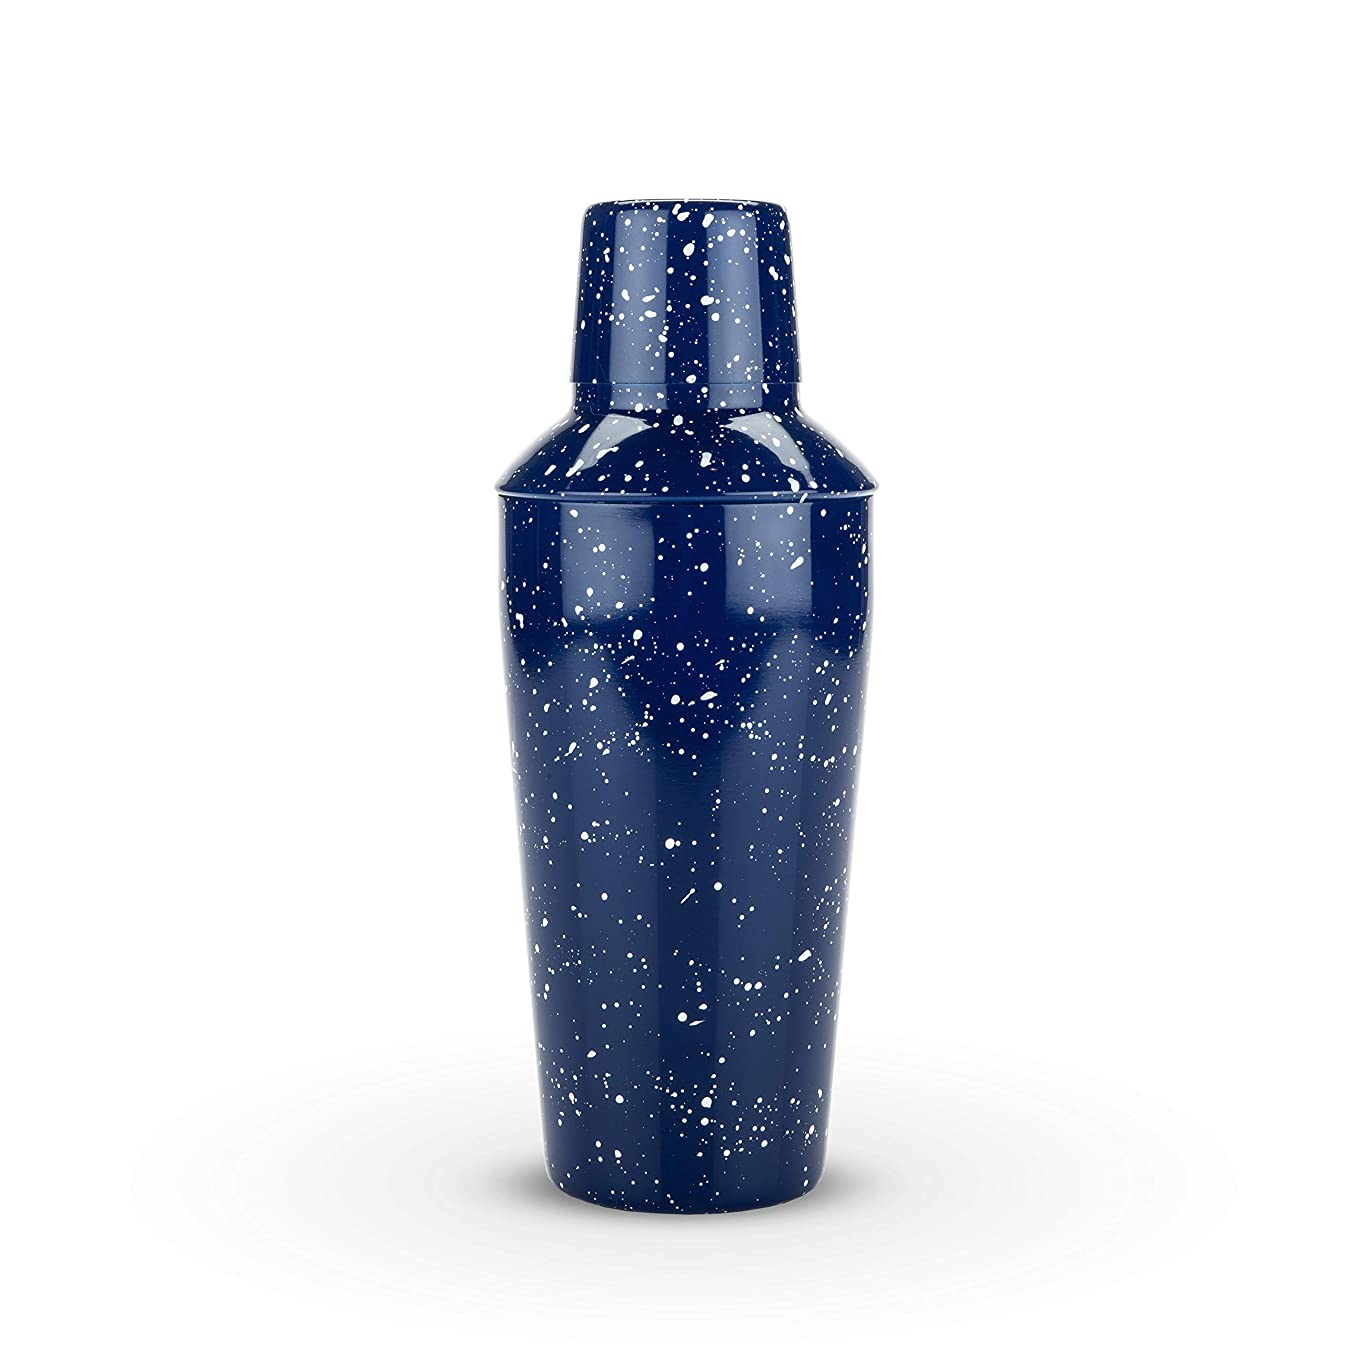 Foster & Rye 4653 Enamel Cocktail Shaker and Jigger Set, Blue